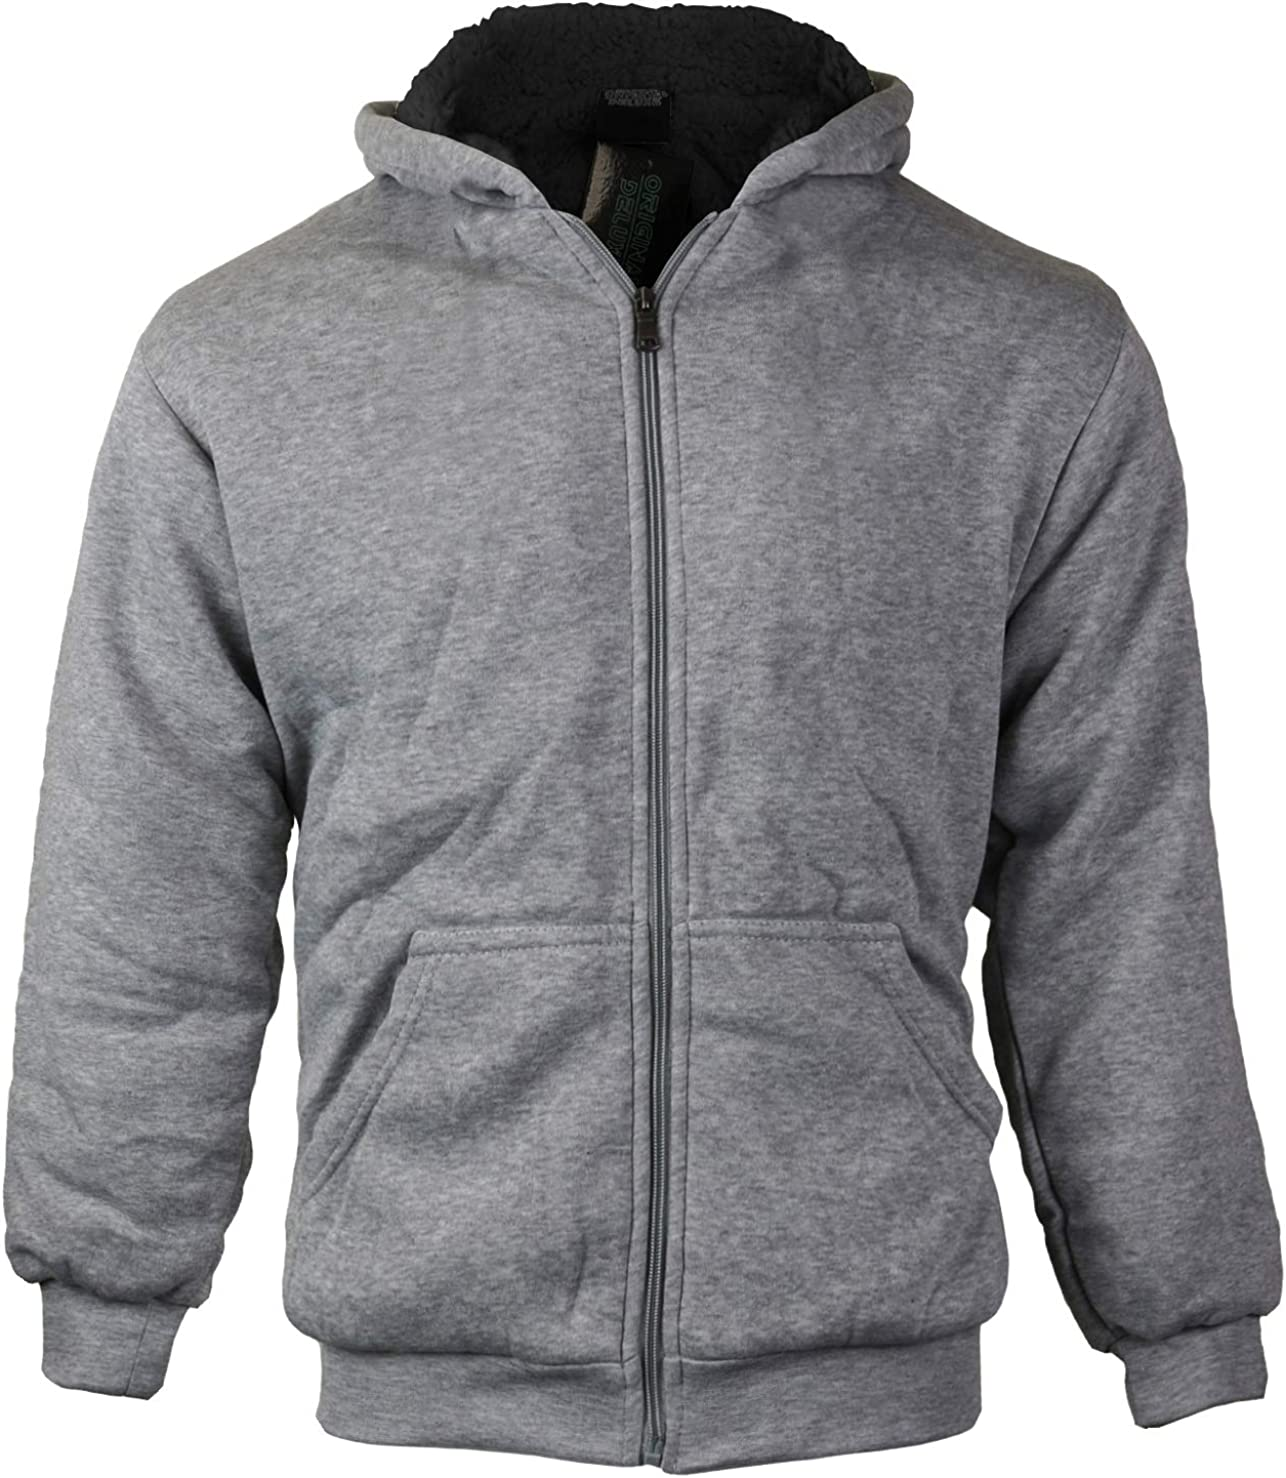 vkwear Boys Kids Athletic Soft Sherpa Zip Up Lined Wholesale Mesa Mall Hoodie Fleece